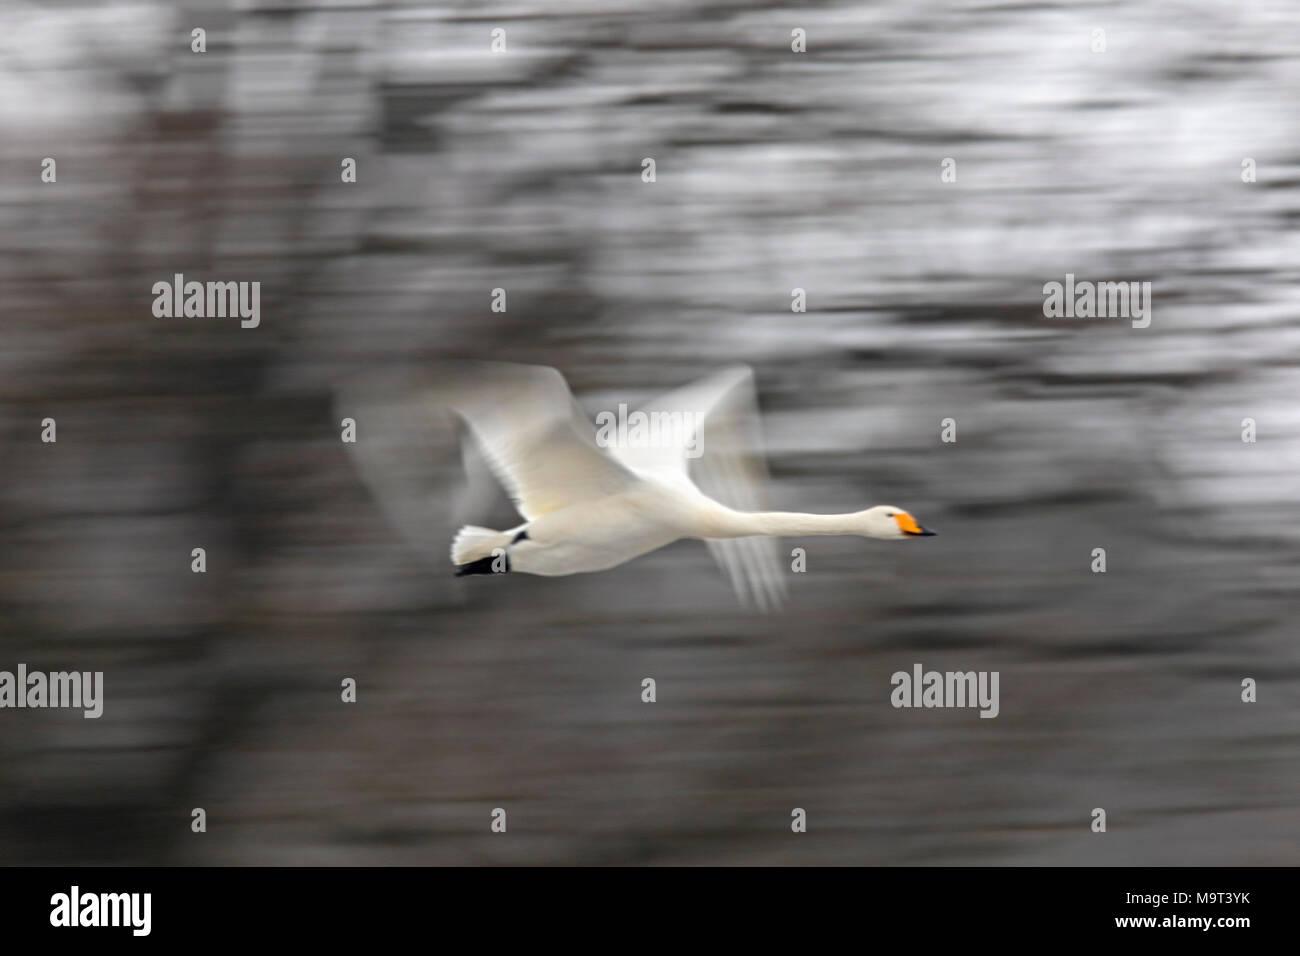 Motion blurred whooper swan (Cygnus cygnus) flying past trees in winter - Stock Image